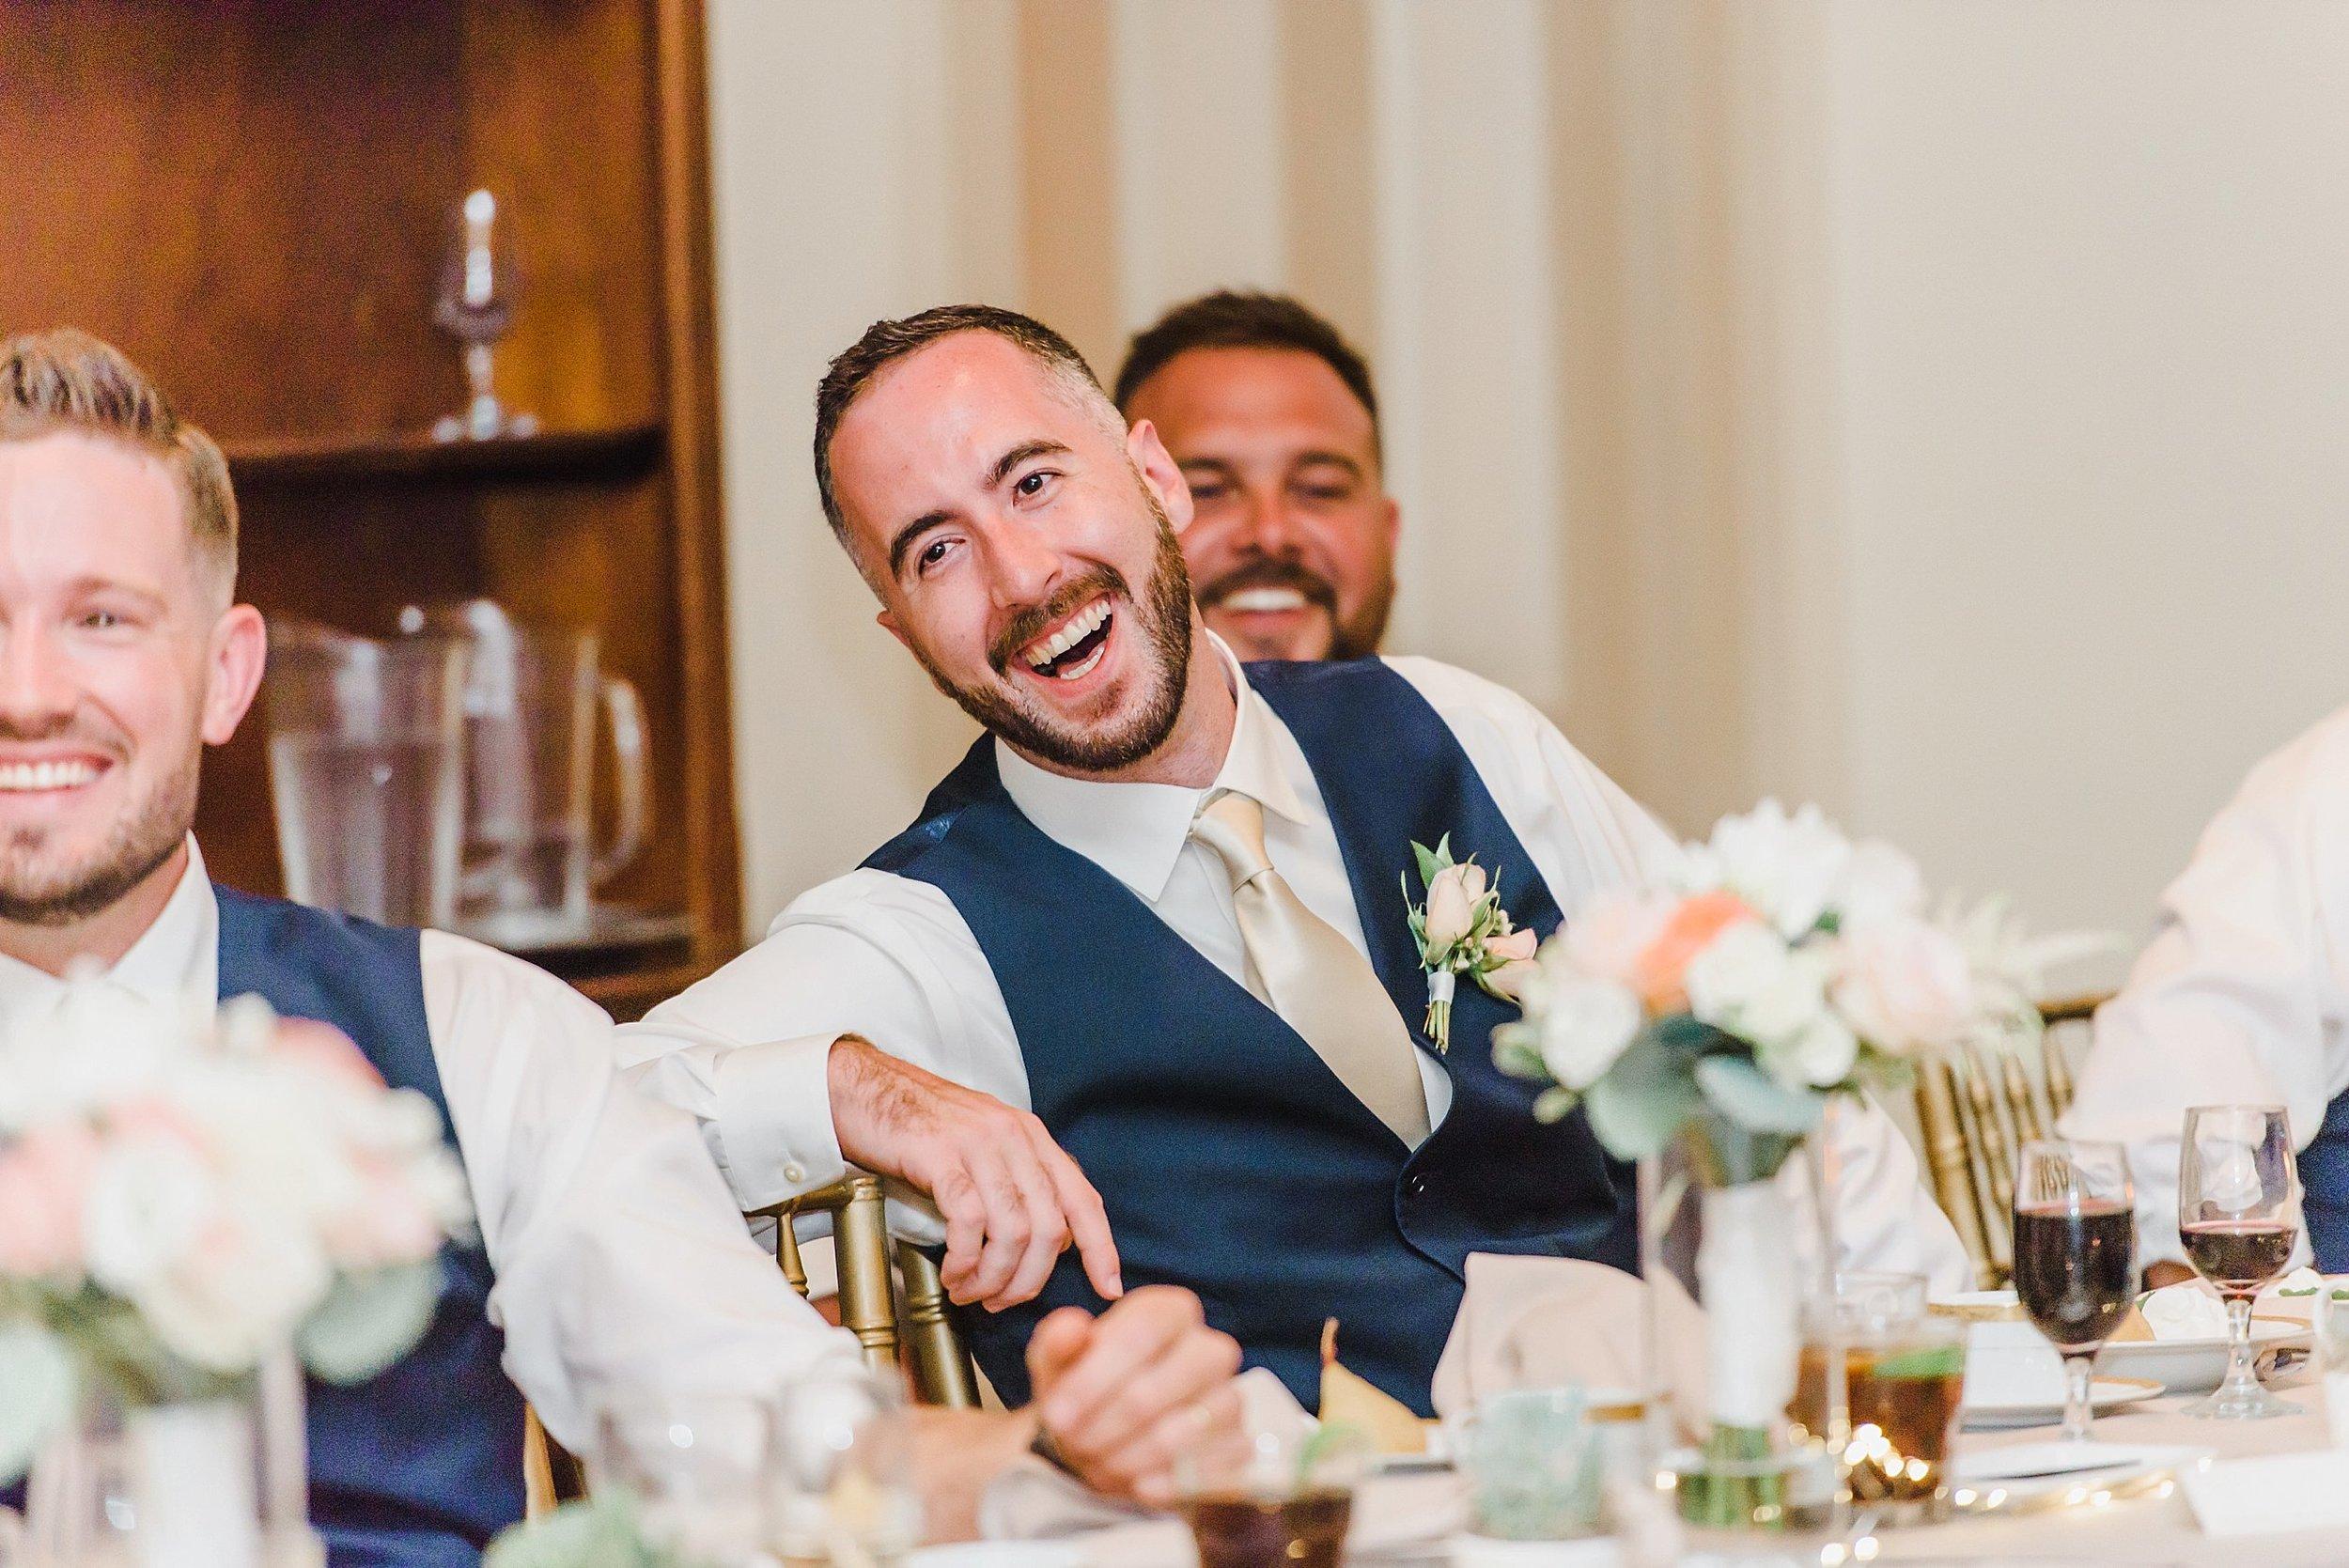 light airy indie fine art ottawa wedding photographer | Ali and Batoul Photography_0222.jpg